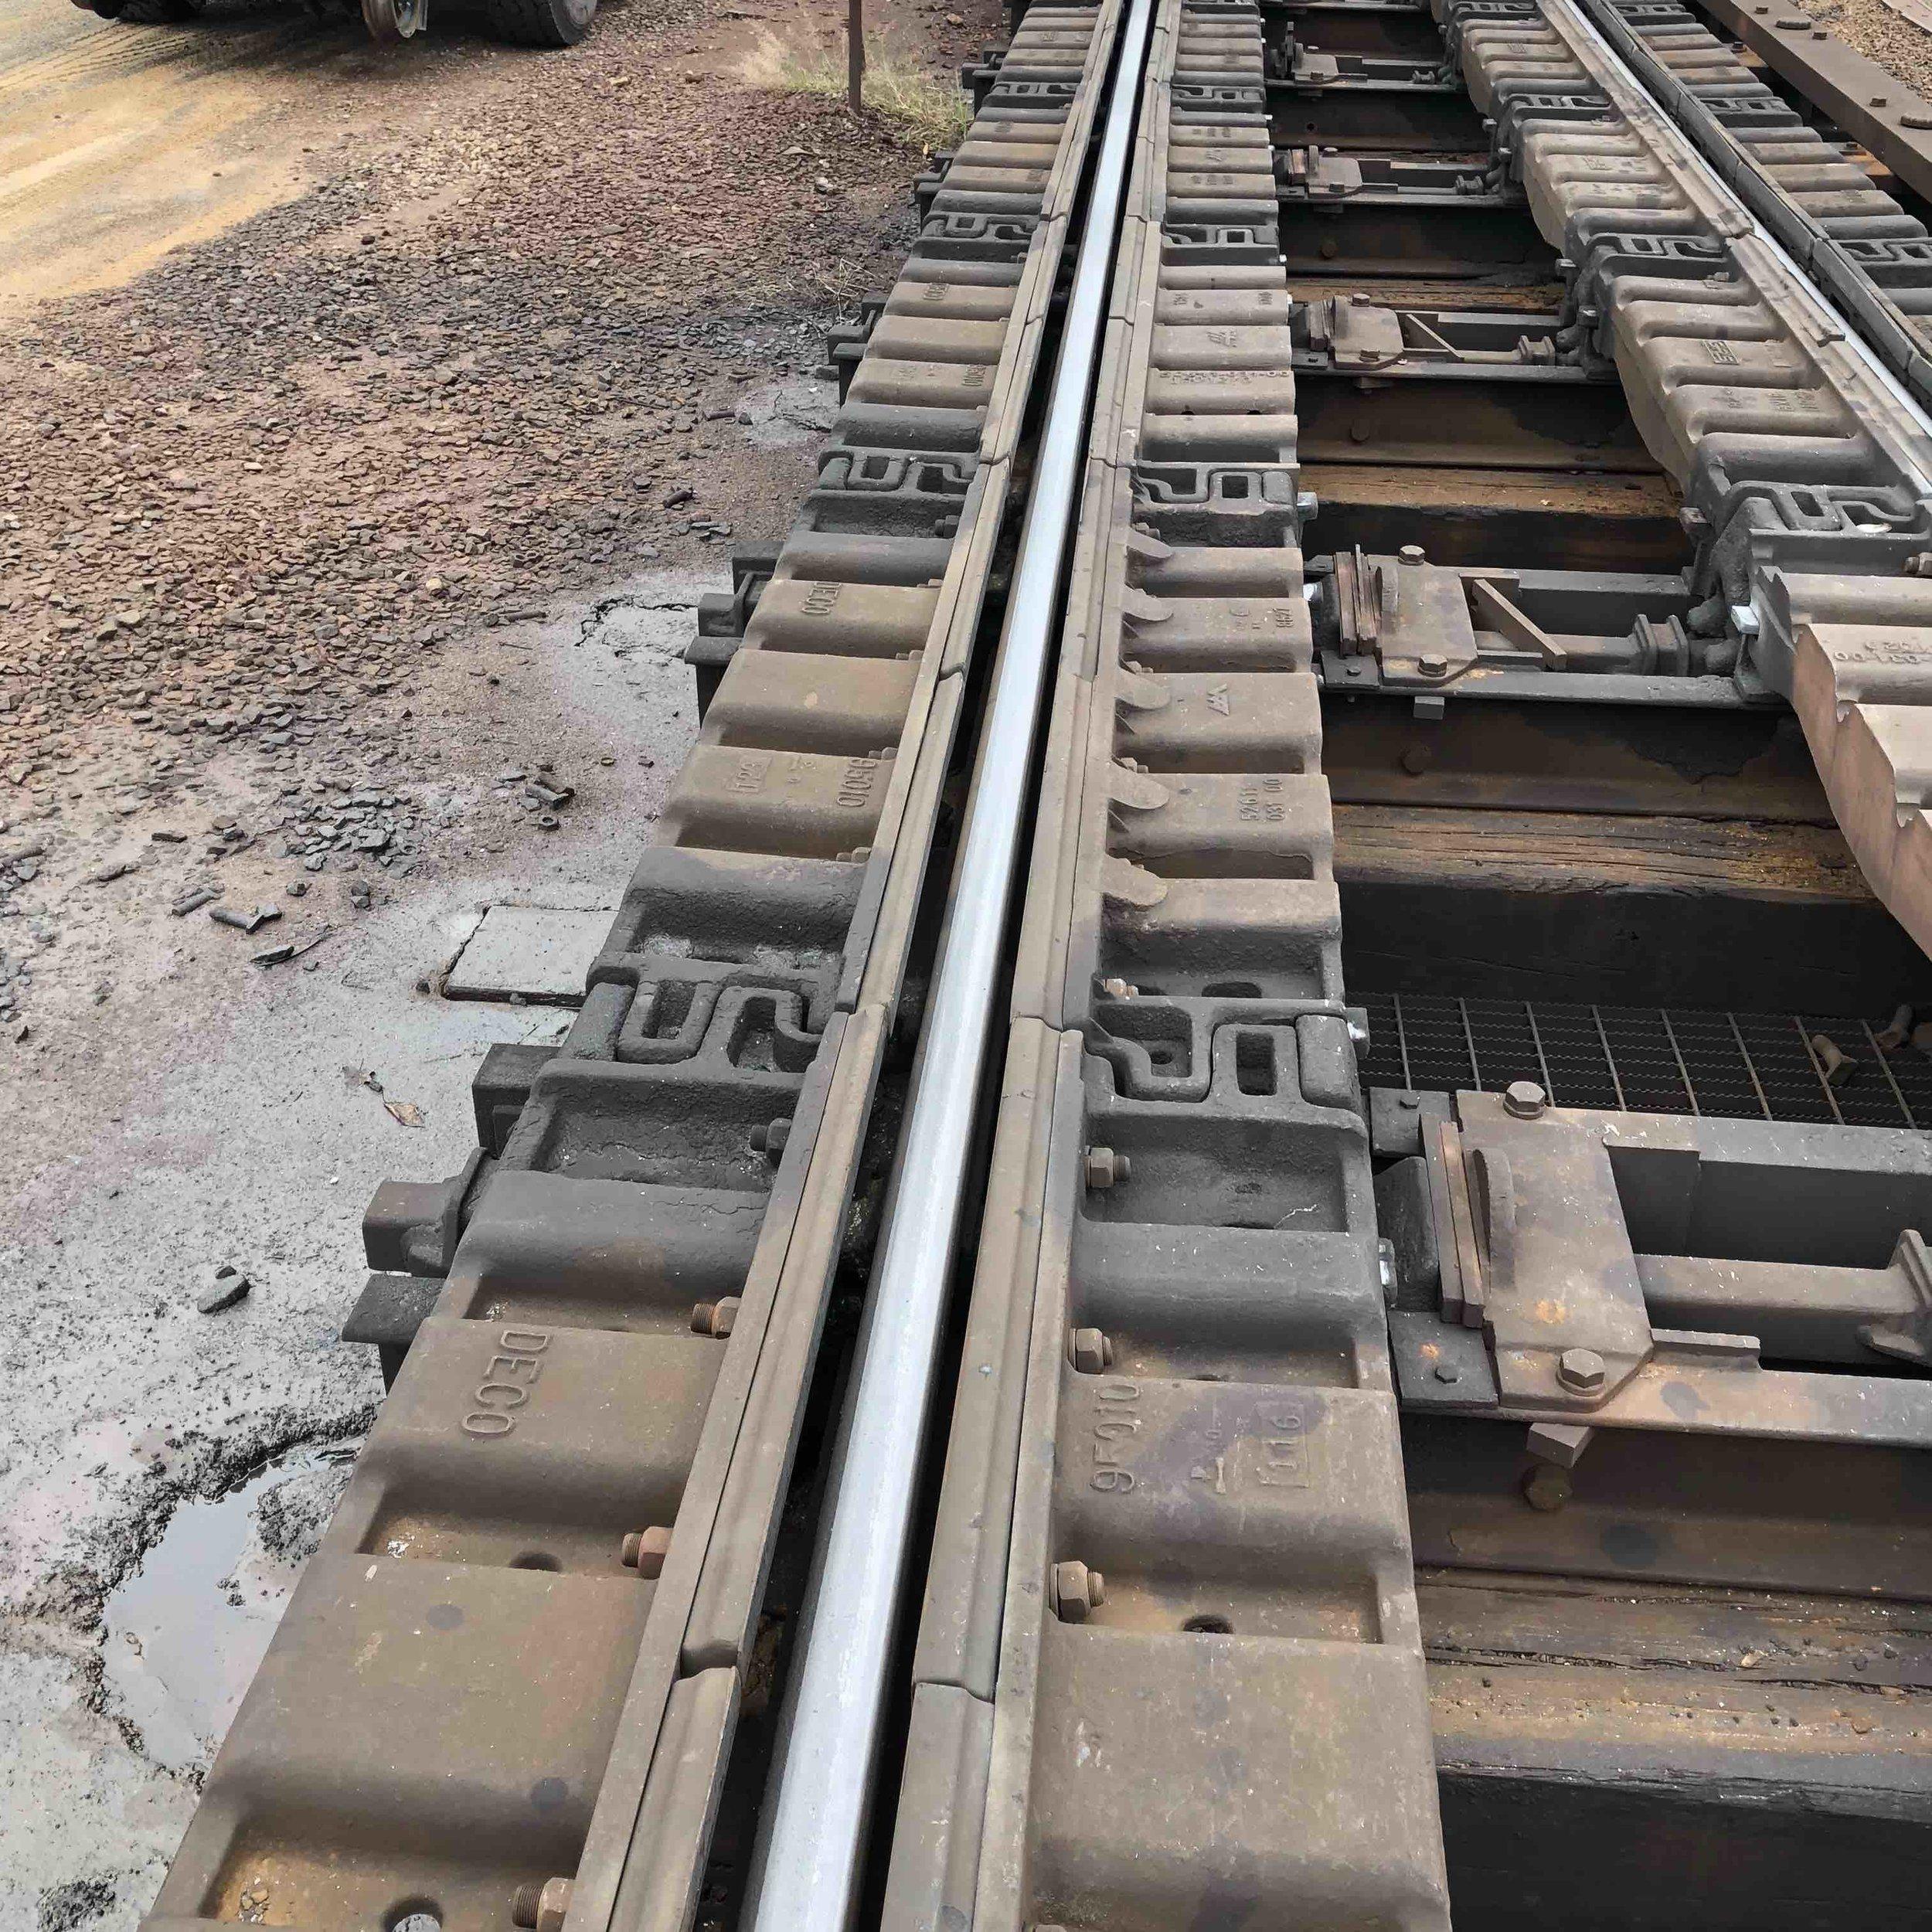 4x-track-maintenance-2.jpg